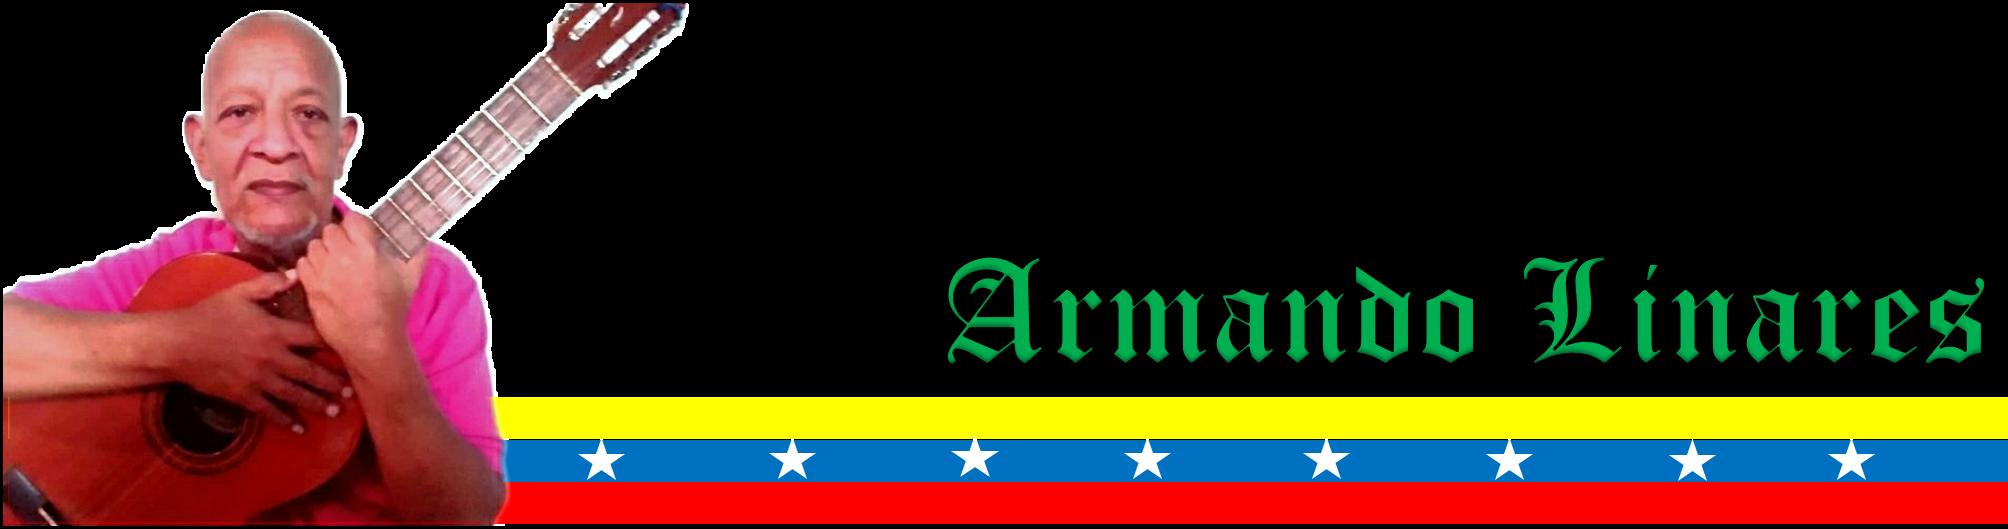 armandolnrs firma.png